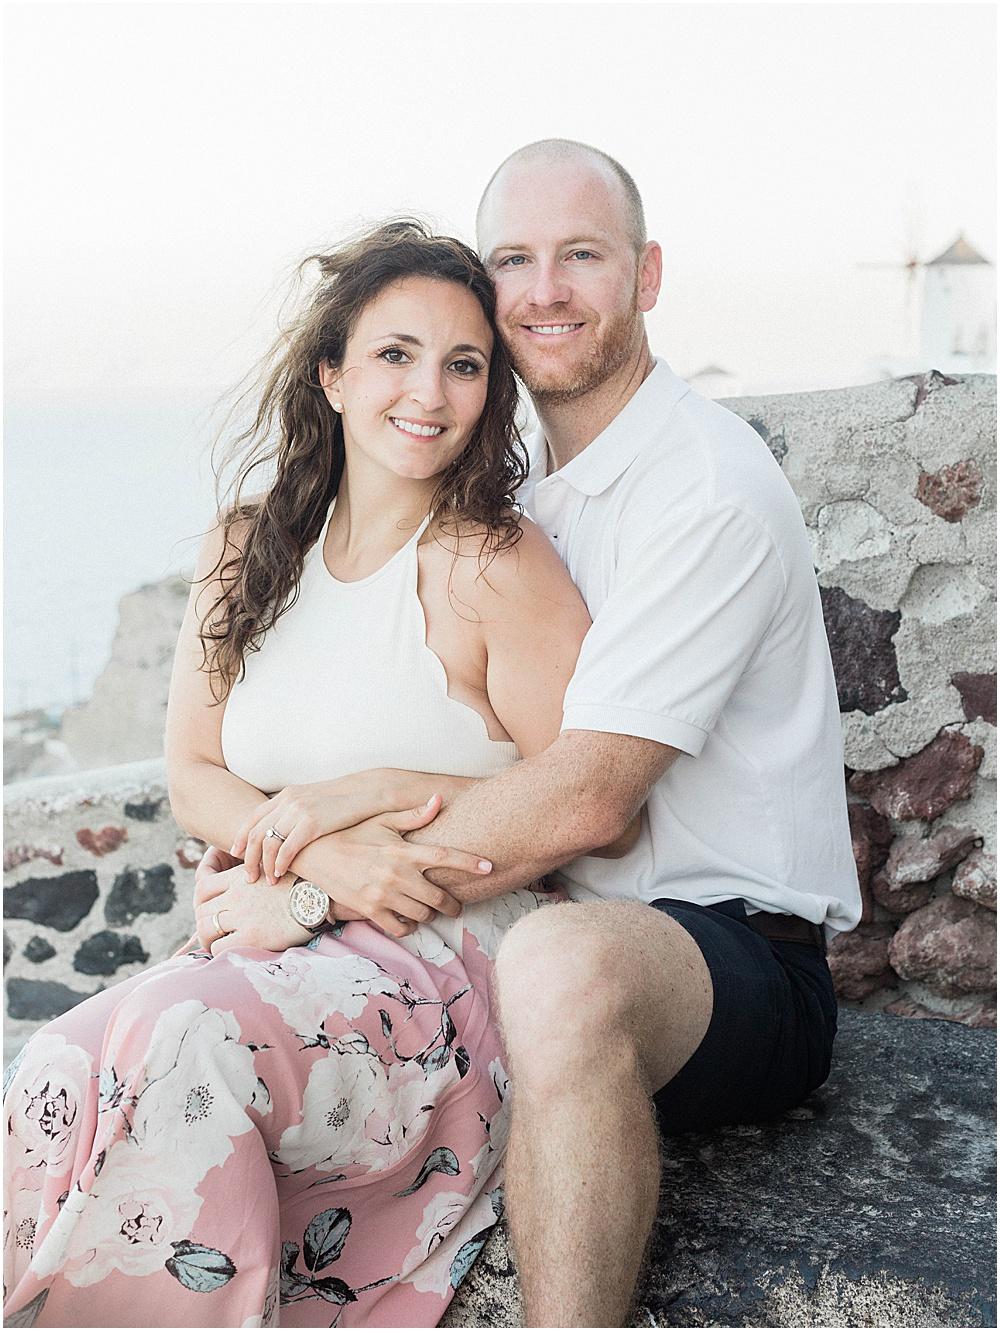 honeymoon_greece_santorini_mykonos_island_ma_boston_wedding_photographer_meredith_jane_photography_photo_0063.jpg